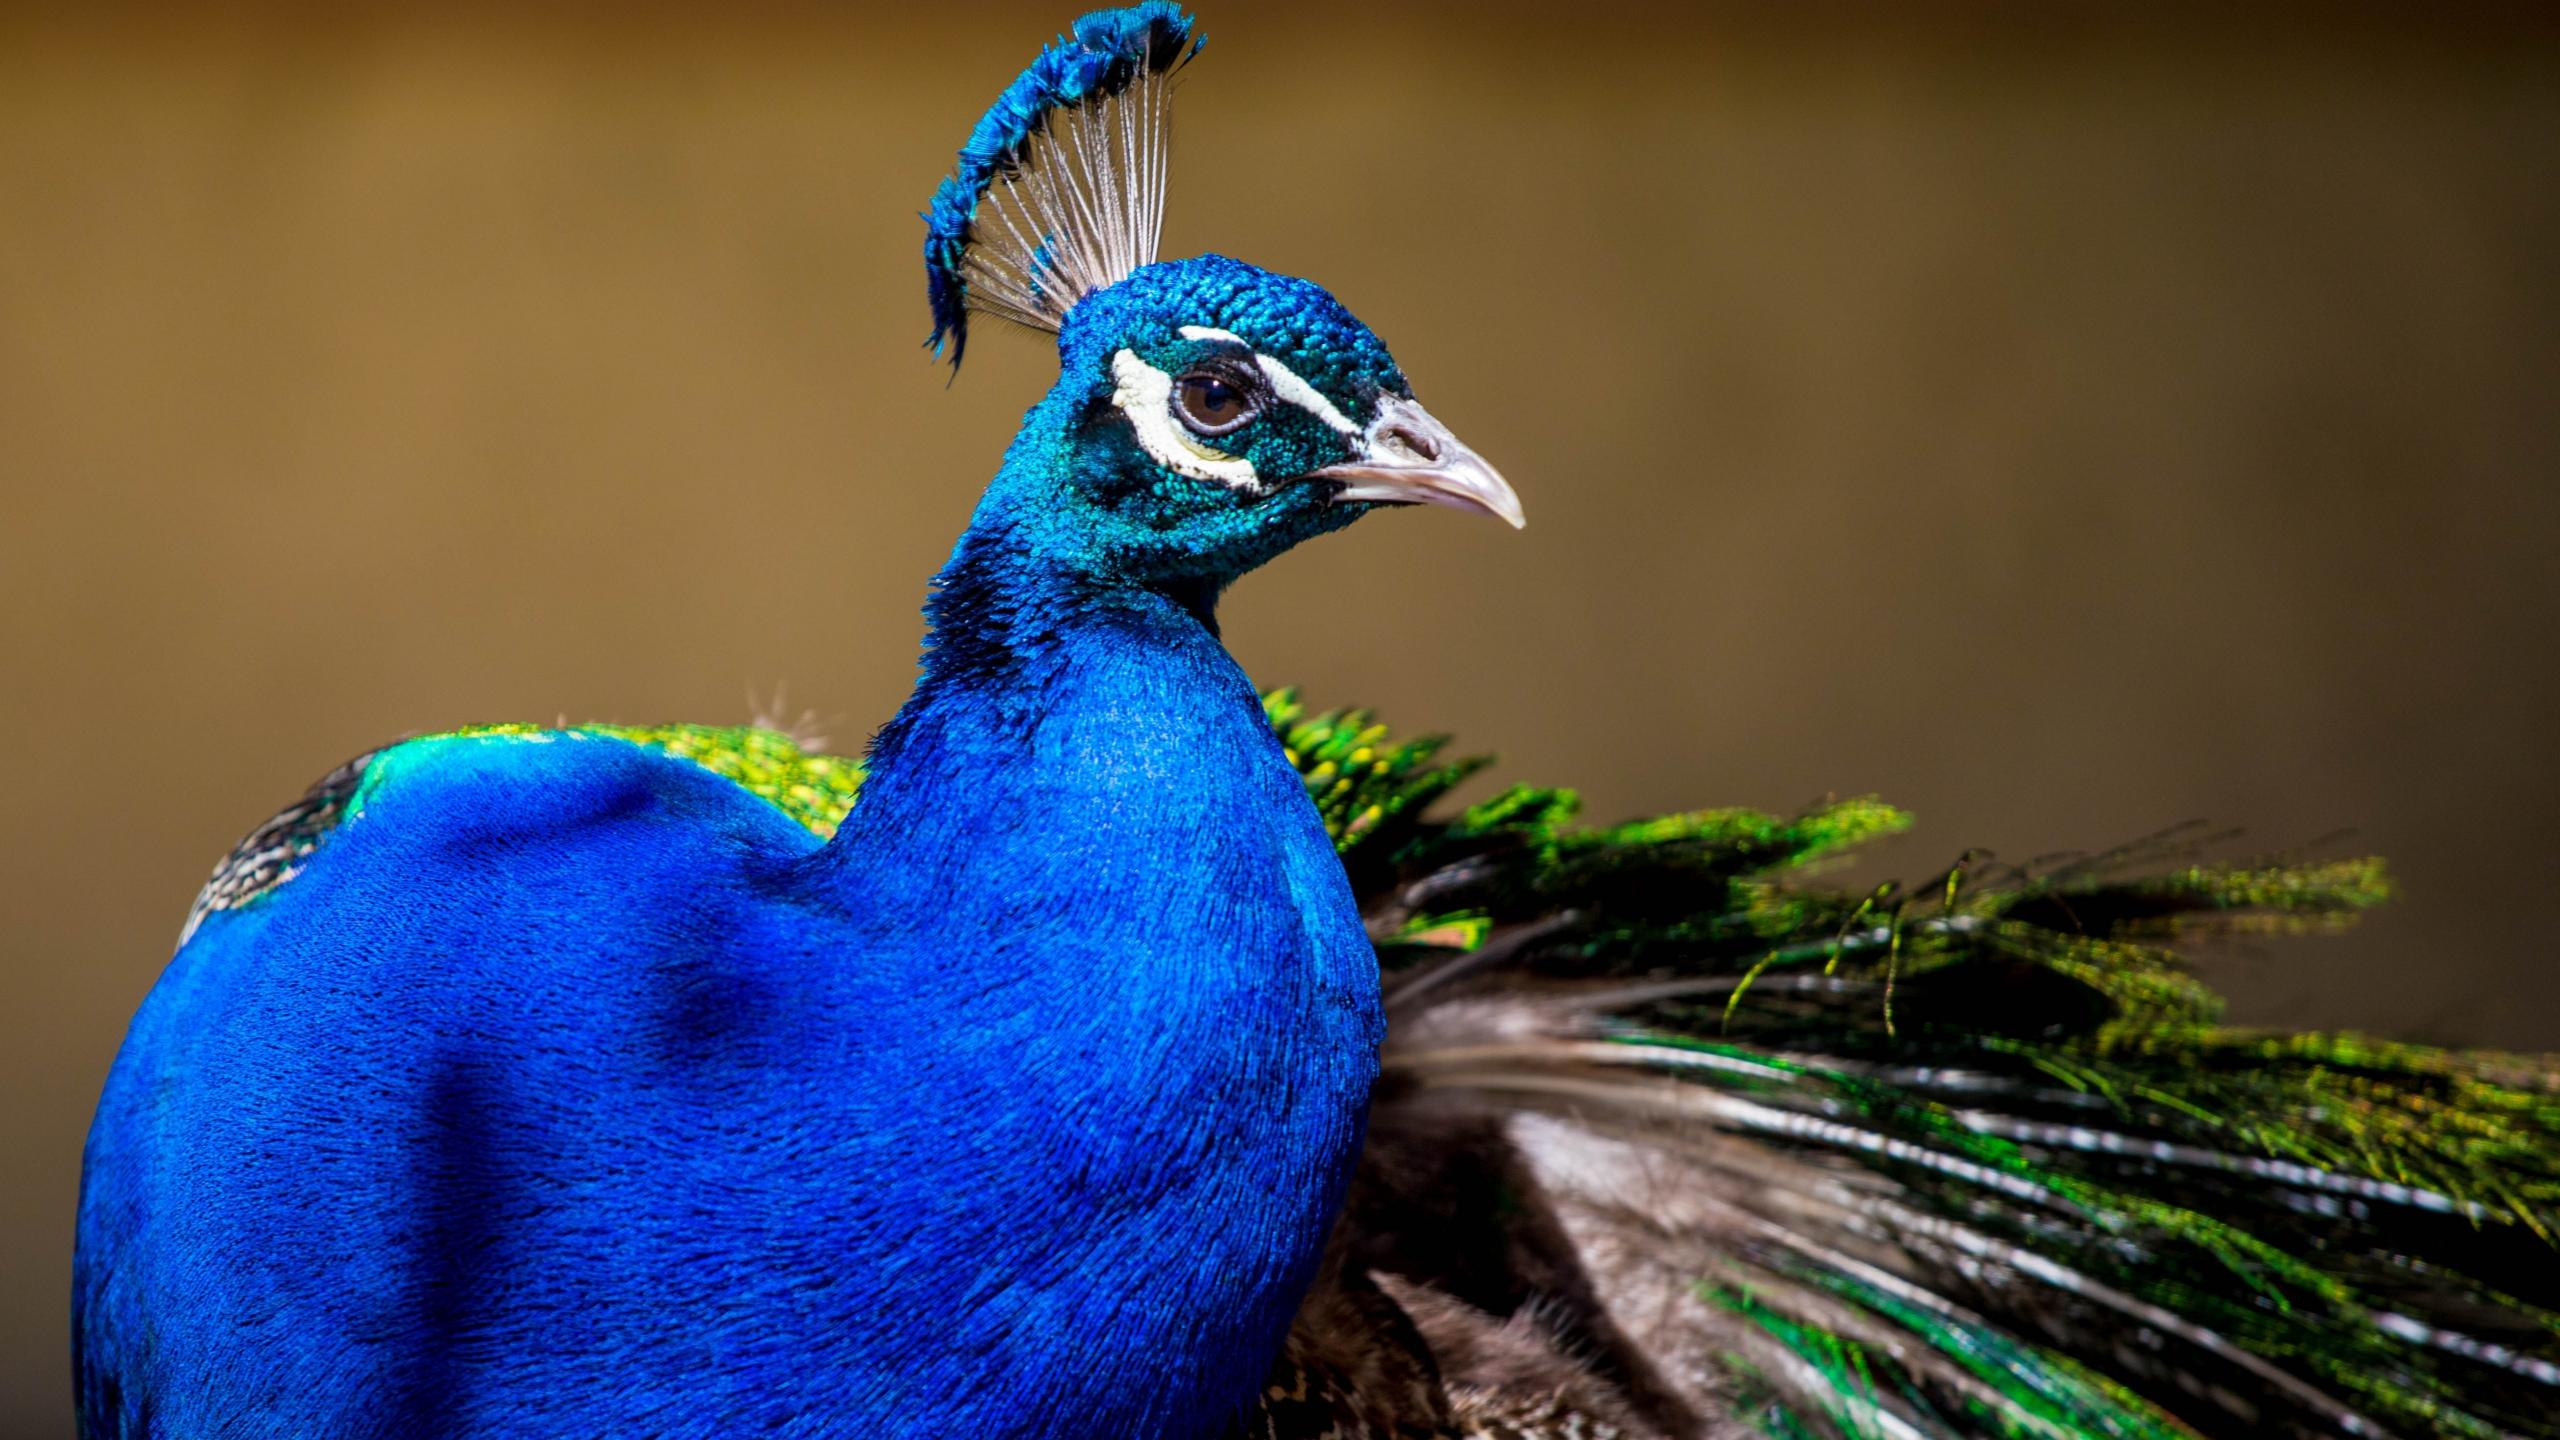 Peacock, colorful bird, plumage, 2560x1440 wallpaper